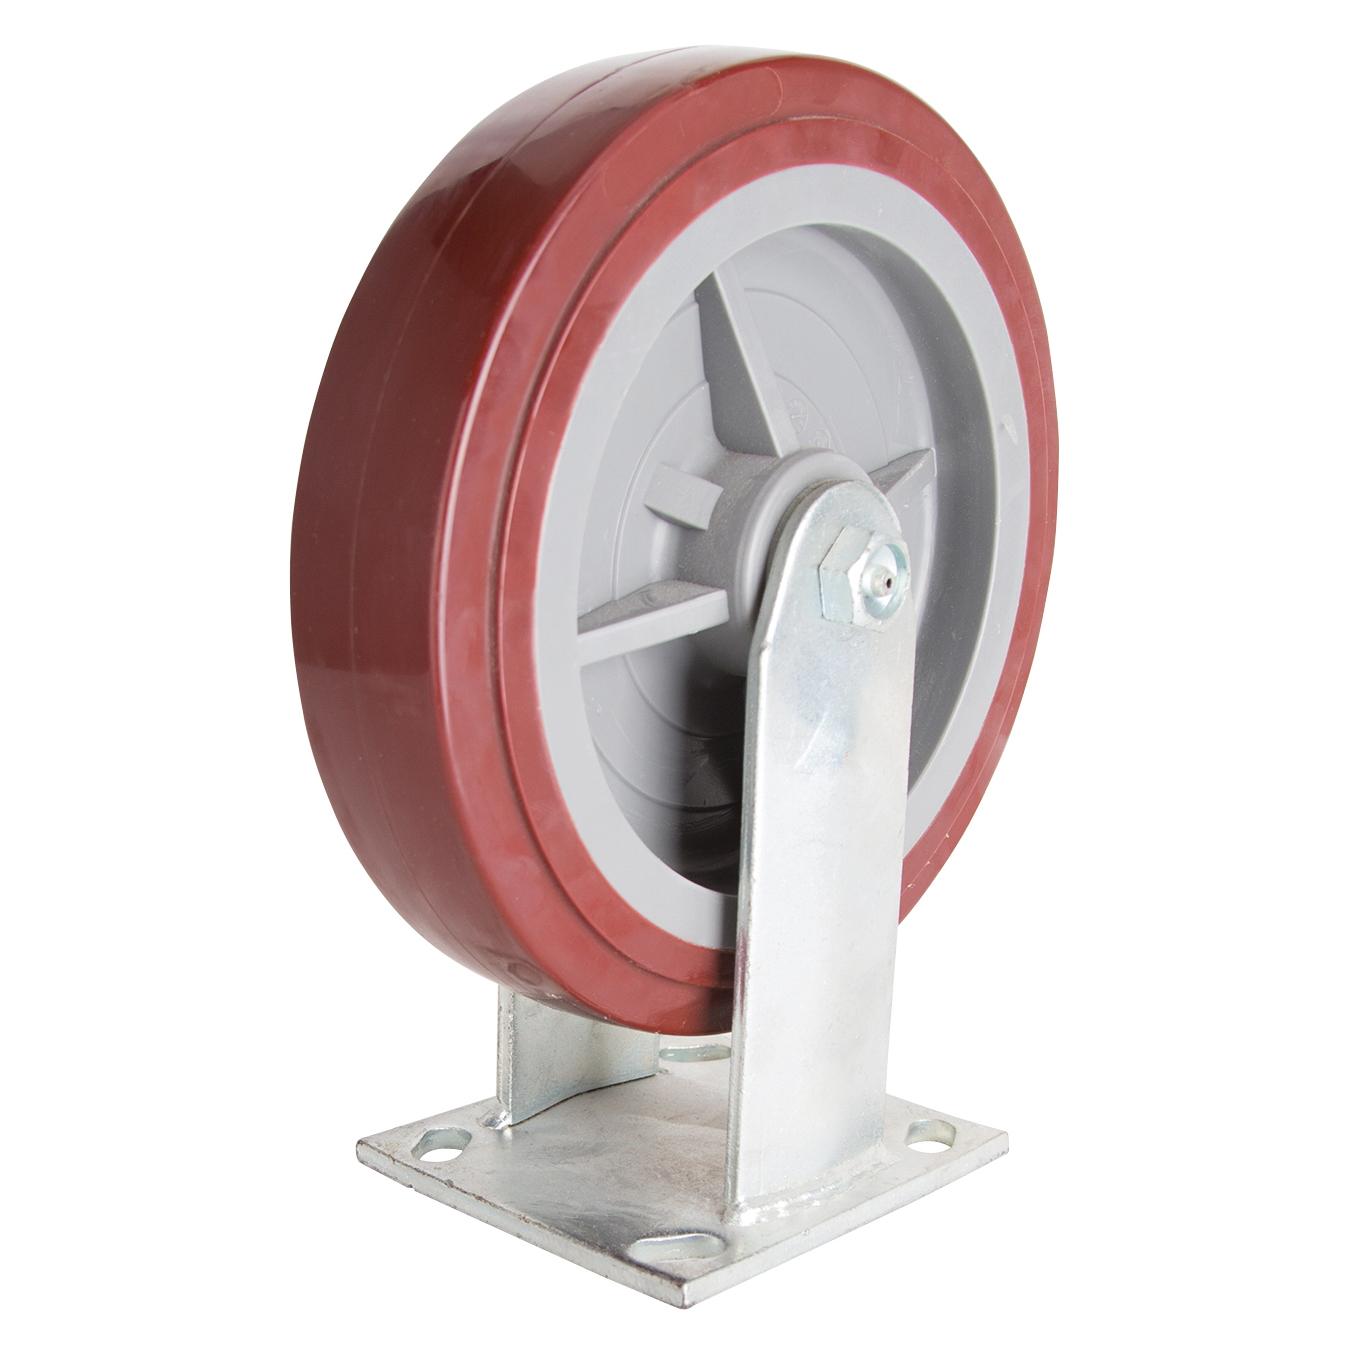 Picture of ProSource JC-P07 Rigid Caster, 8 in Dia Wheel, 2 in W Wheel, Polyurethane Wheel, 750 lb